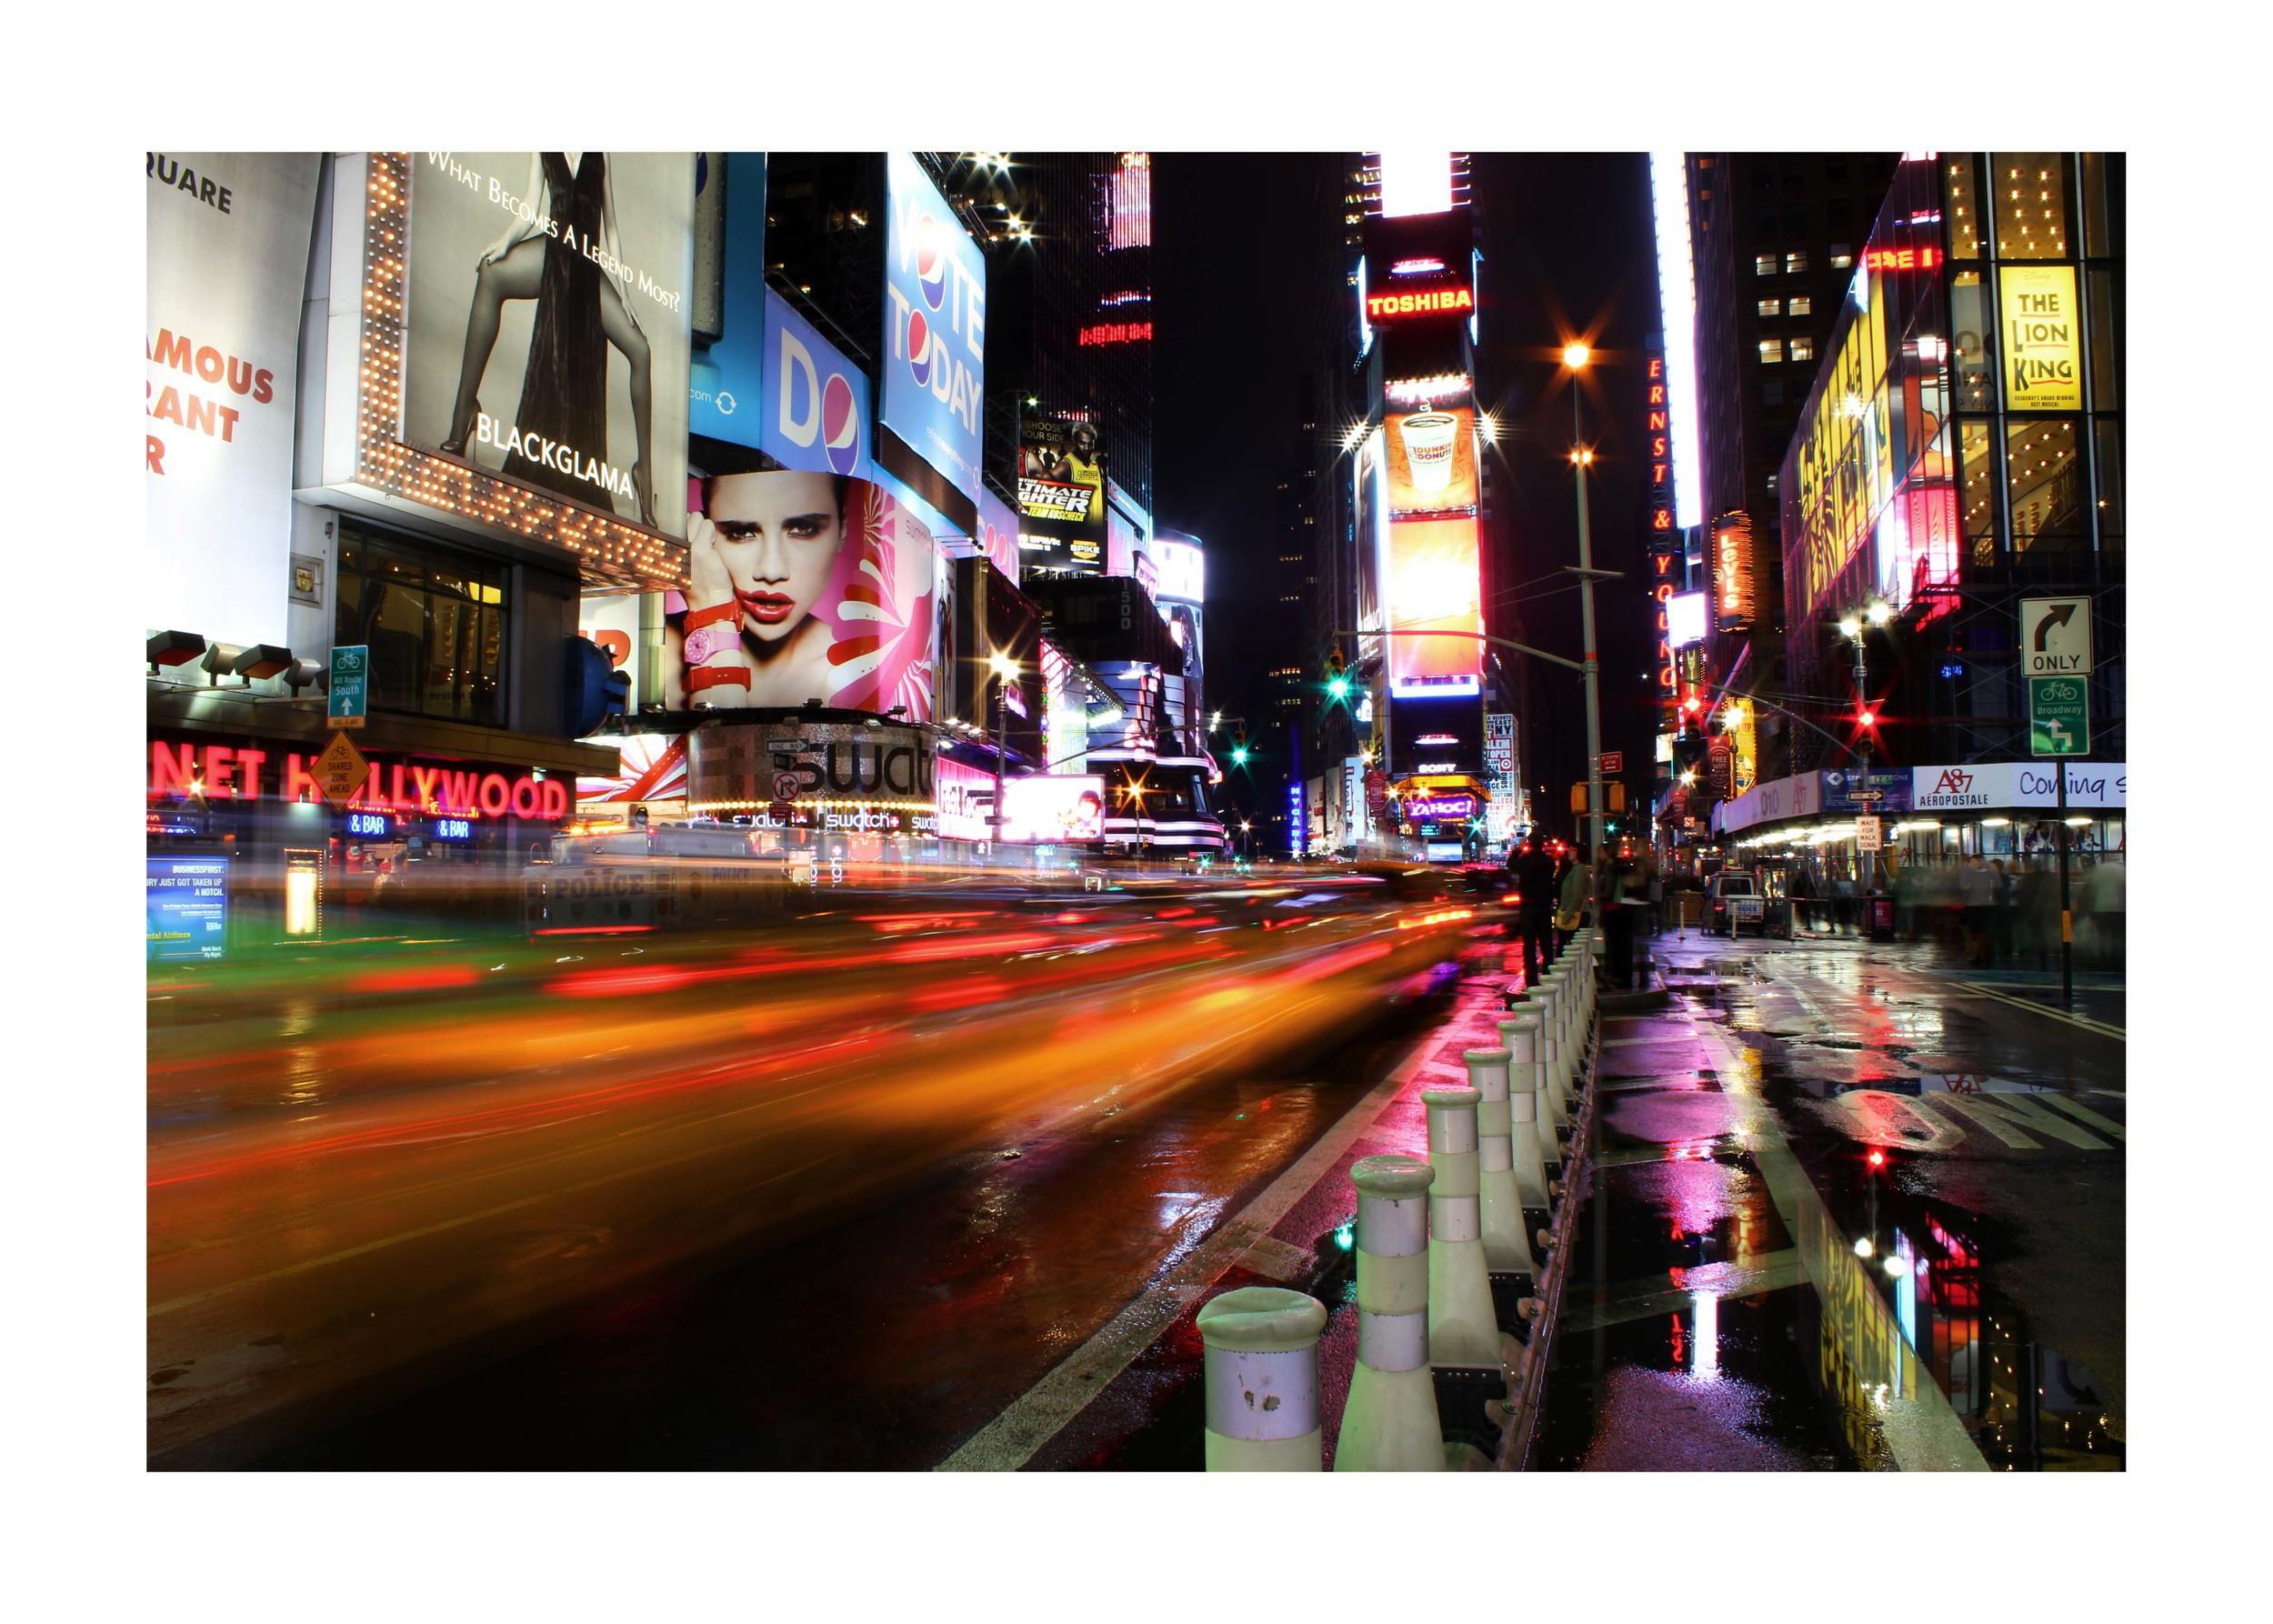 Times Square_nachts Kopie.jpg